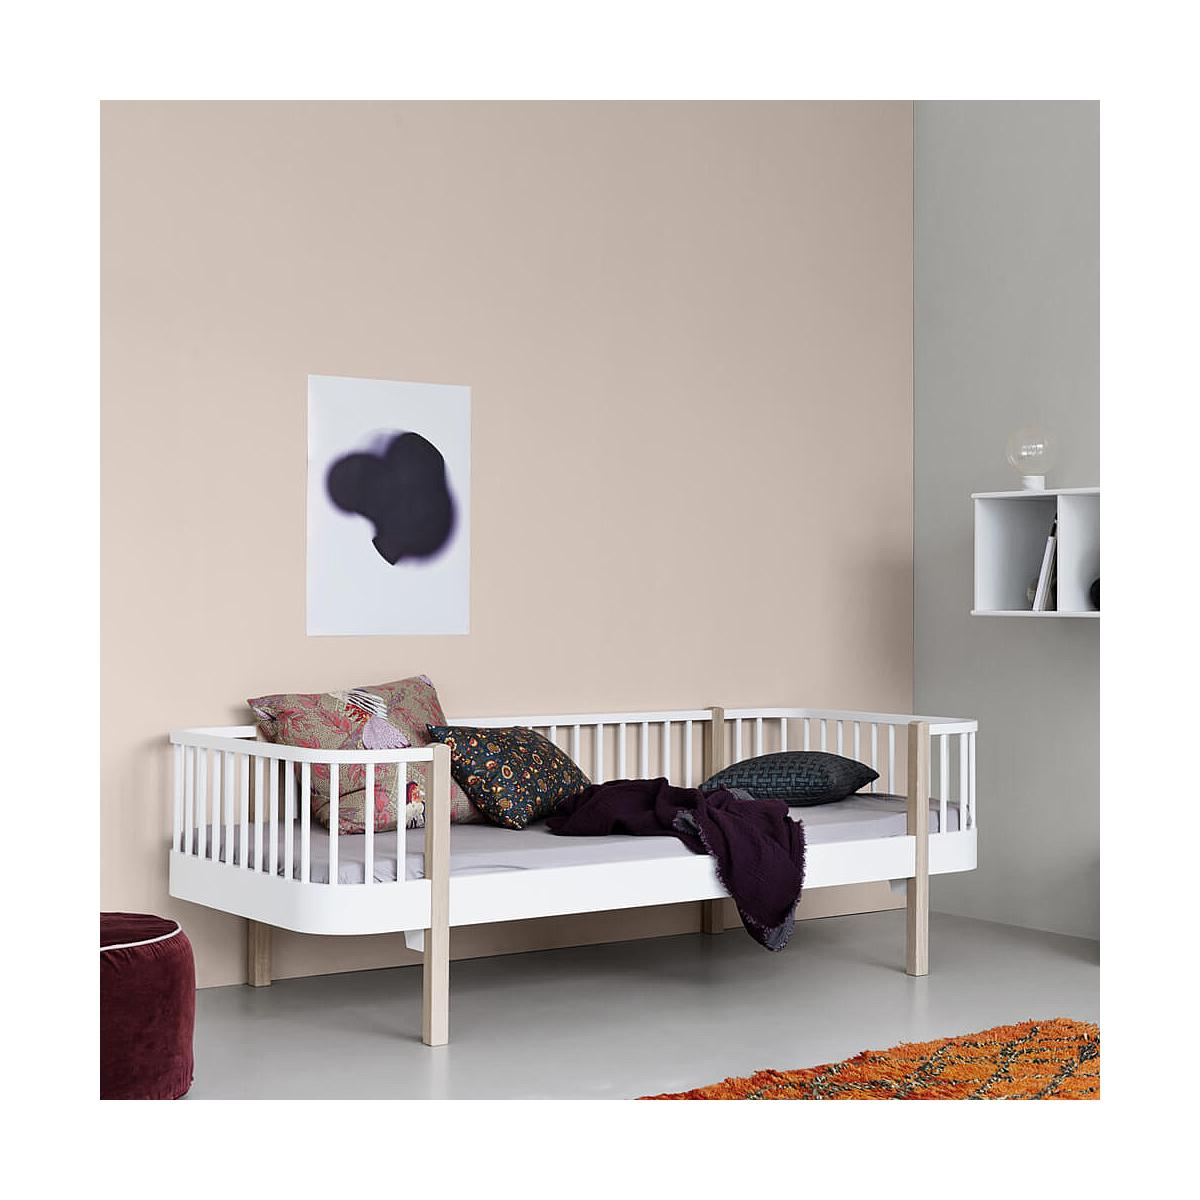 Lit banquette évolutif 90x200cm WOOD Oliver Furniture blanc